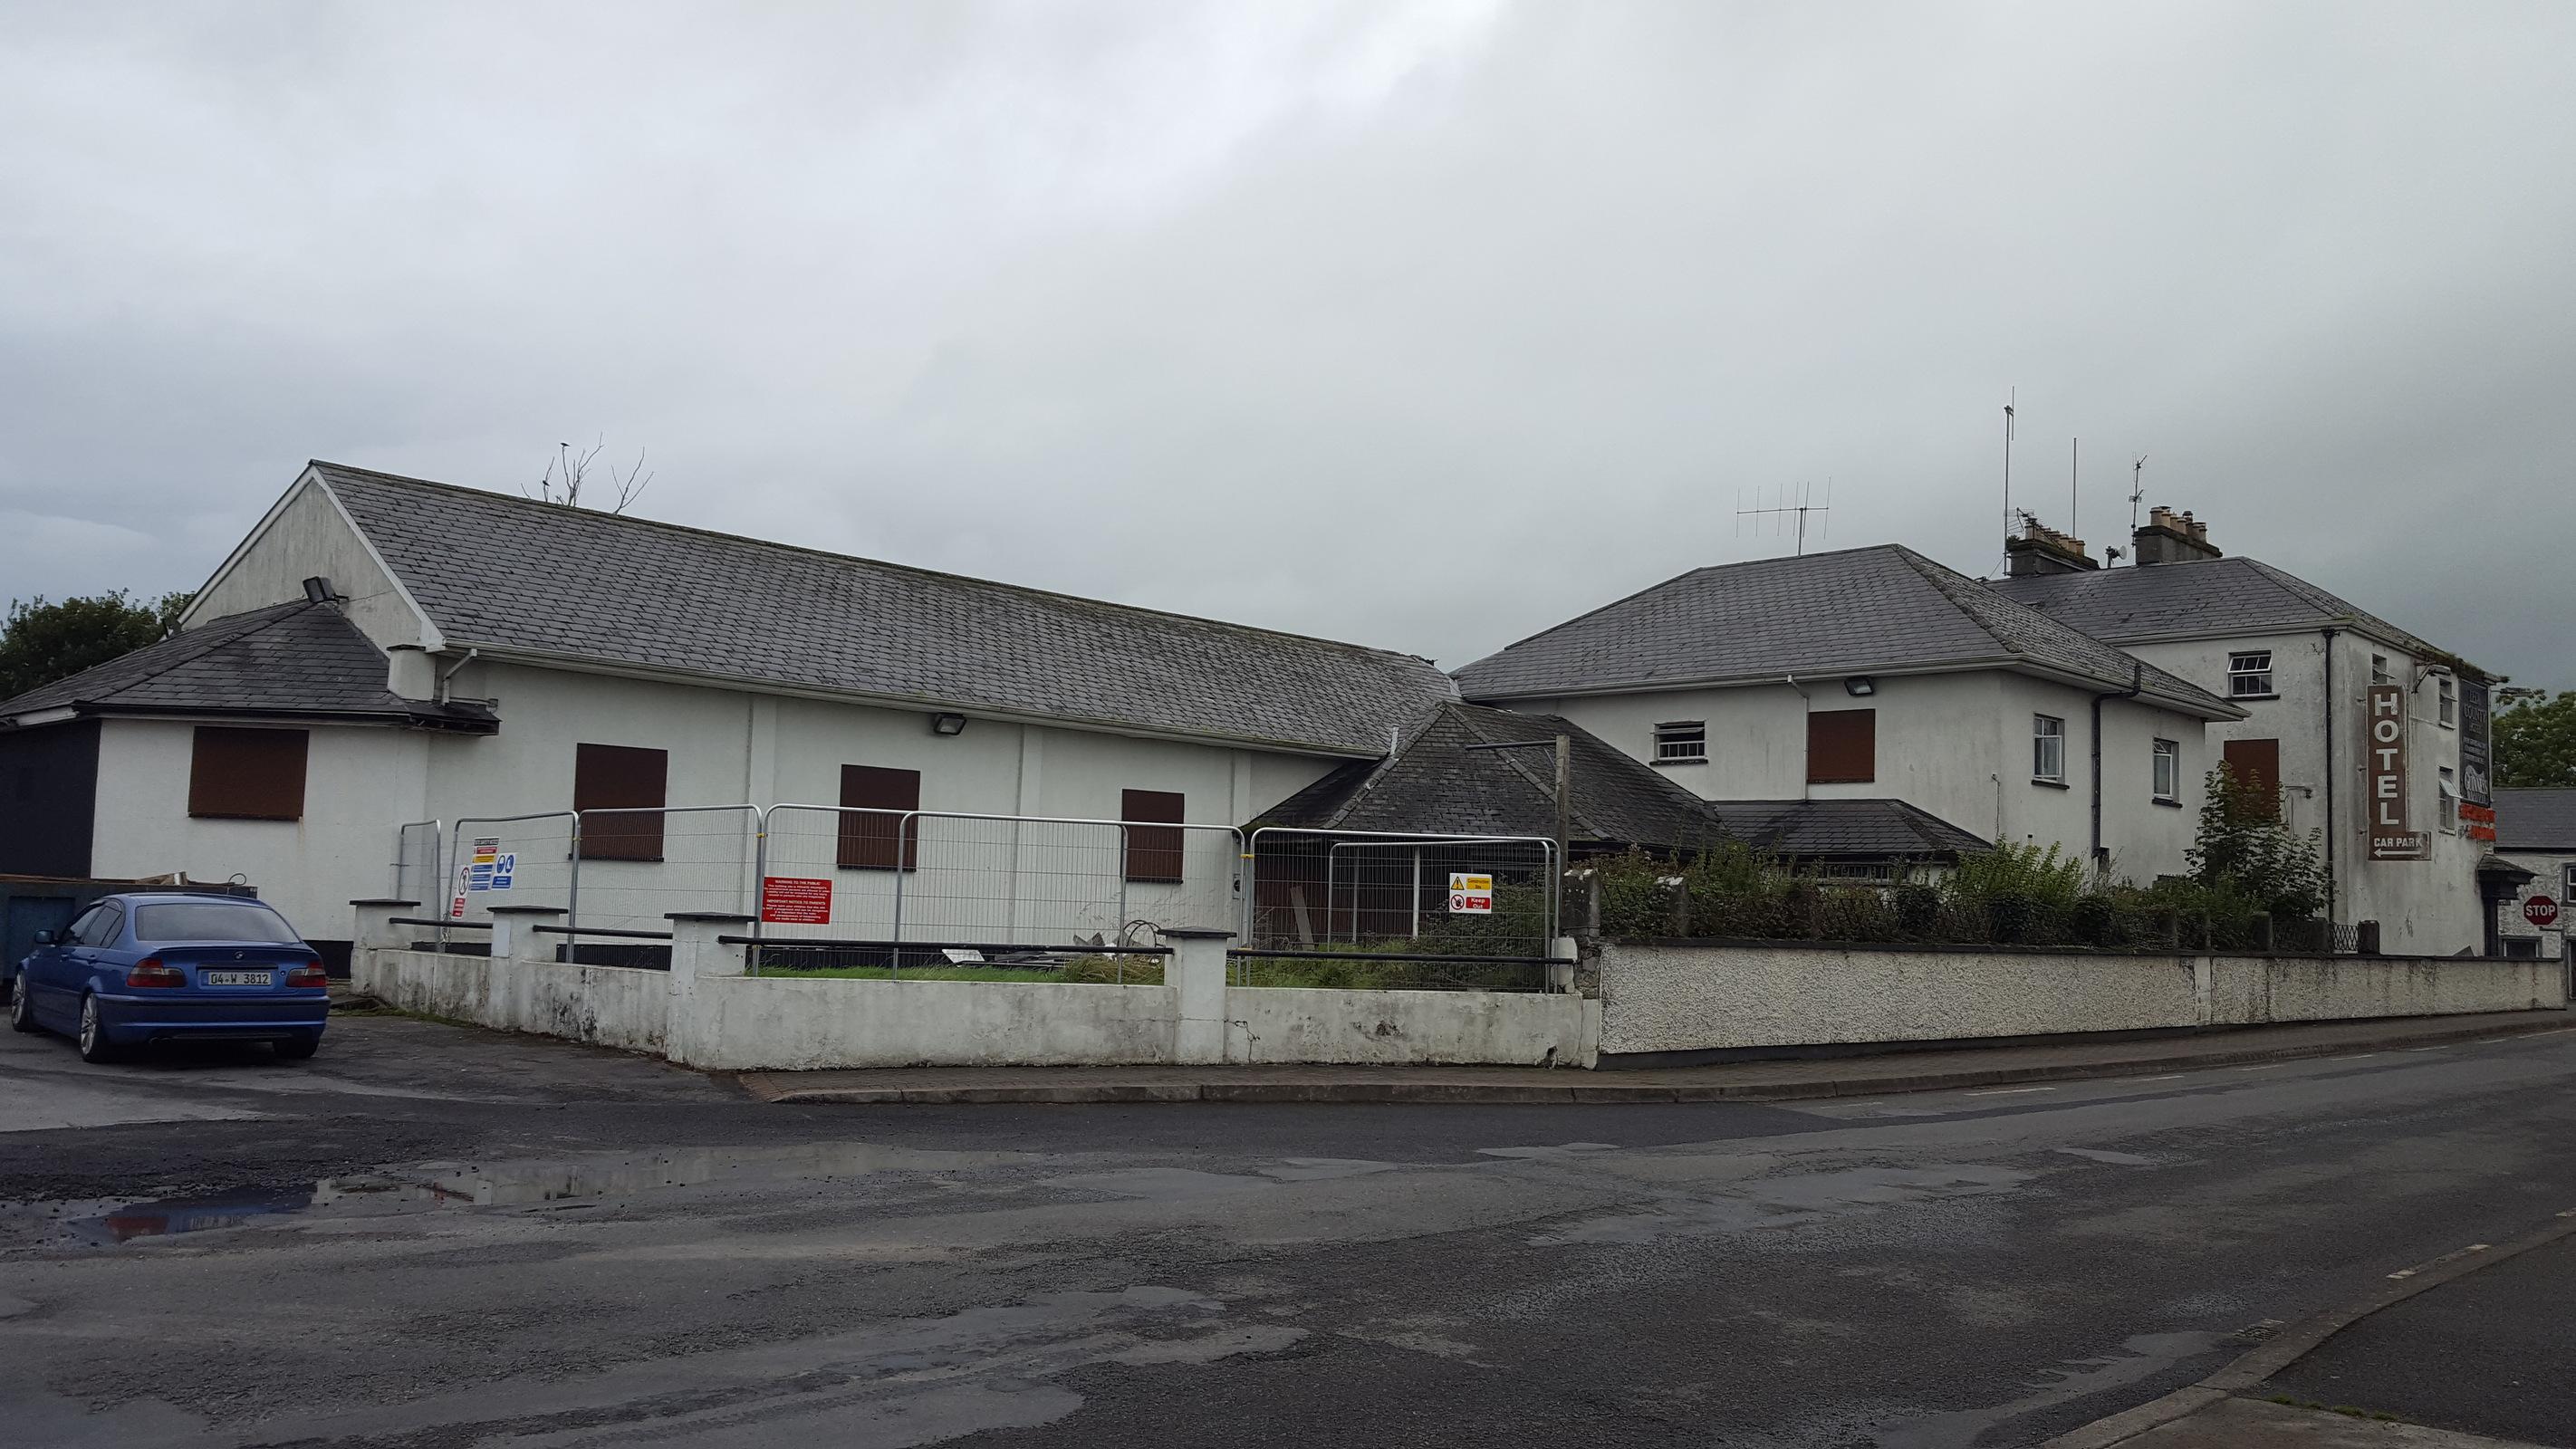 Main Street, Borris-in-Ossory, Co. Laois